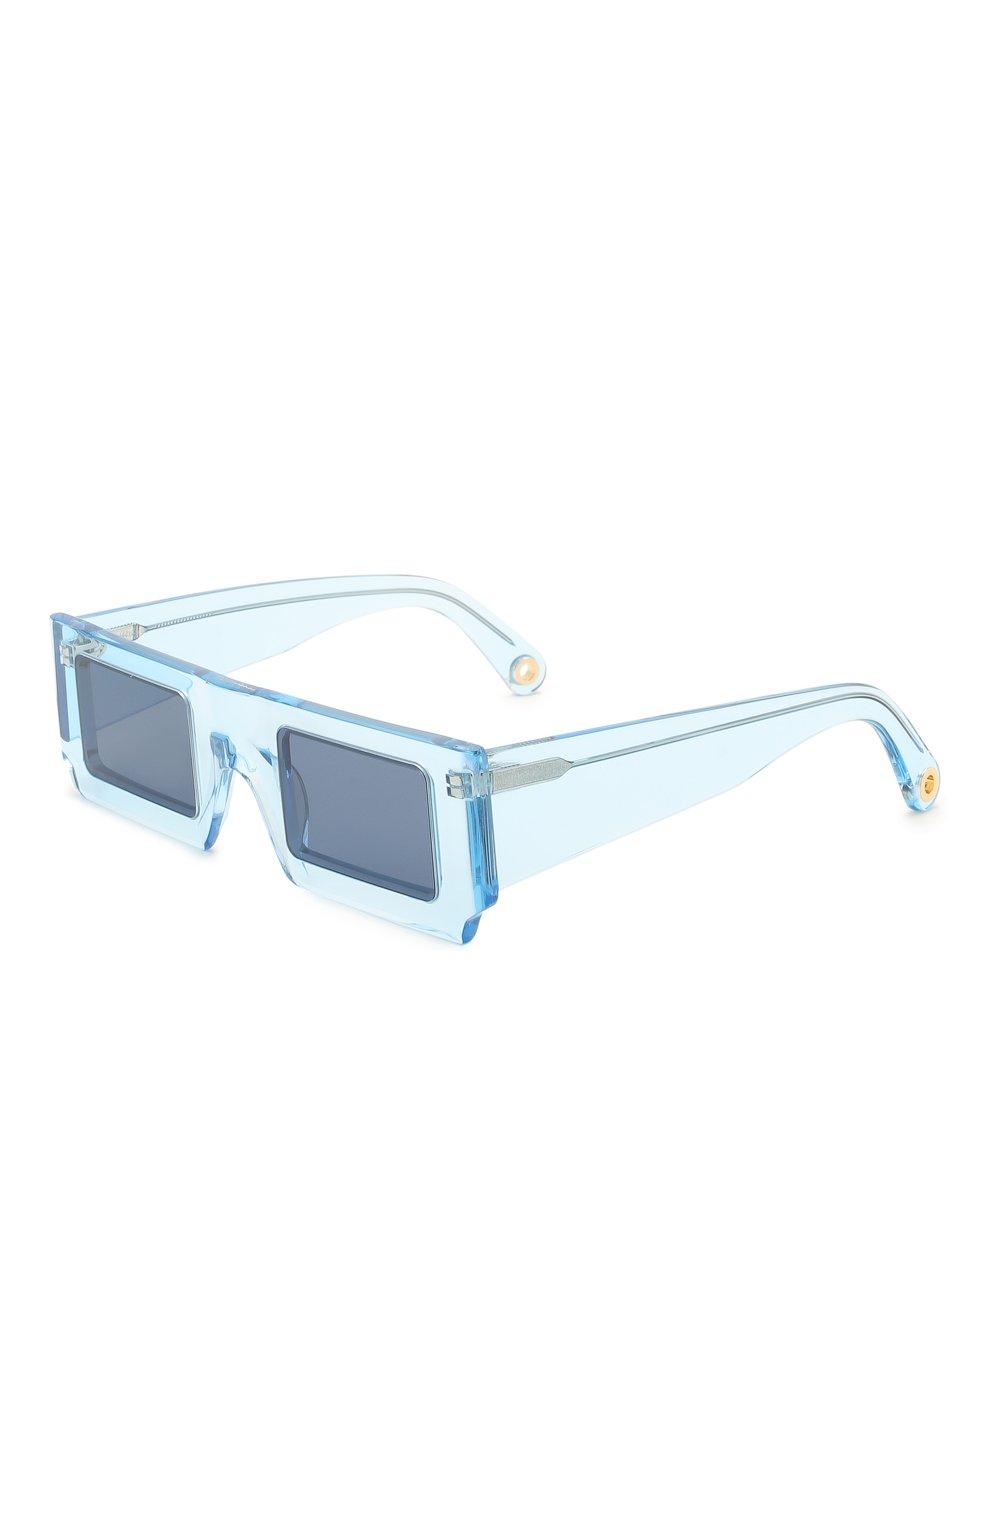 Женские солнцезащитные очки JACQUEMUS голубого цвета, арт. LES LUNETTES S0LEIL SHADE 0F BLUE | Фото 1